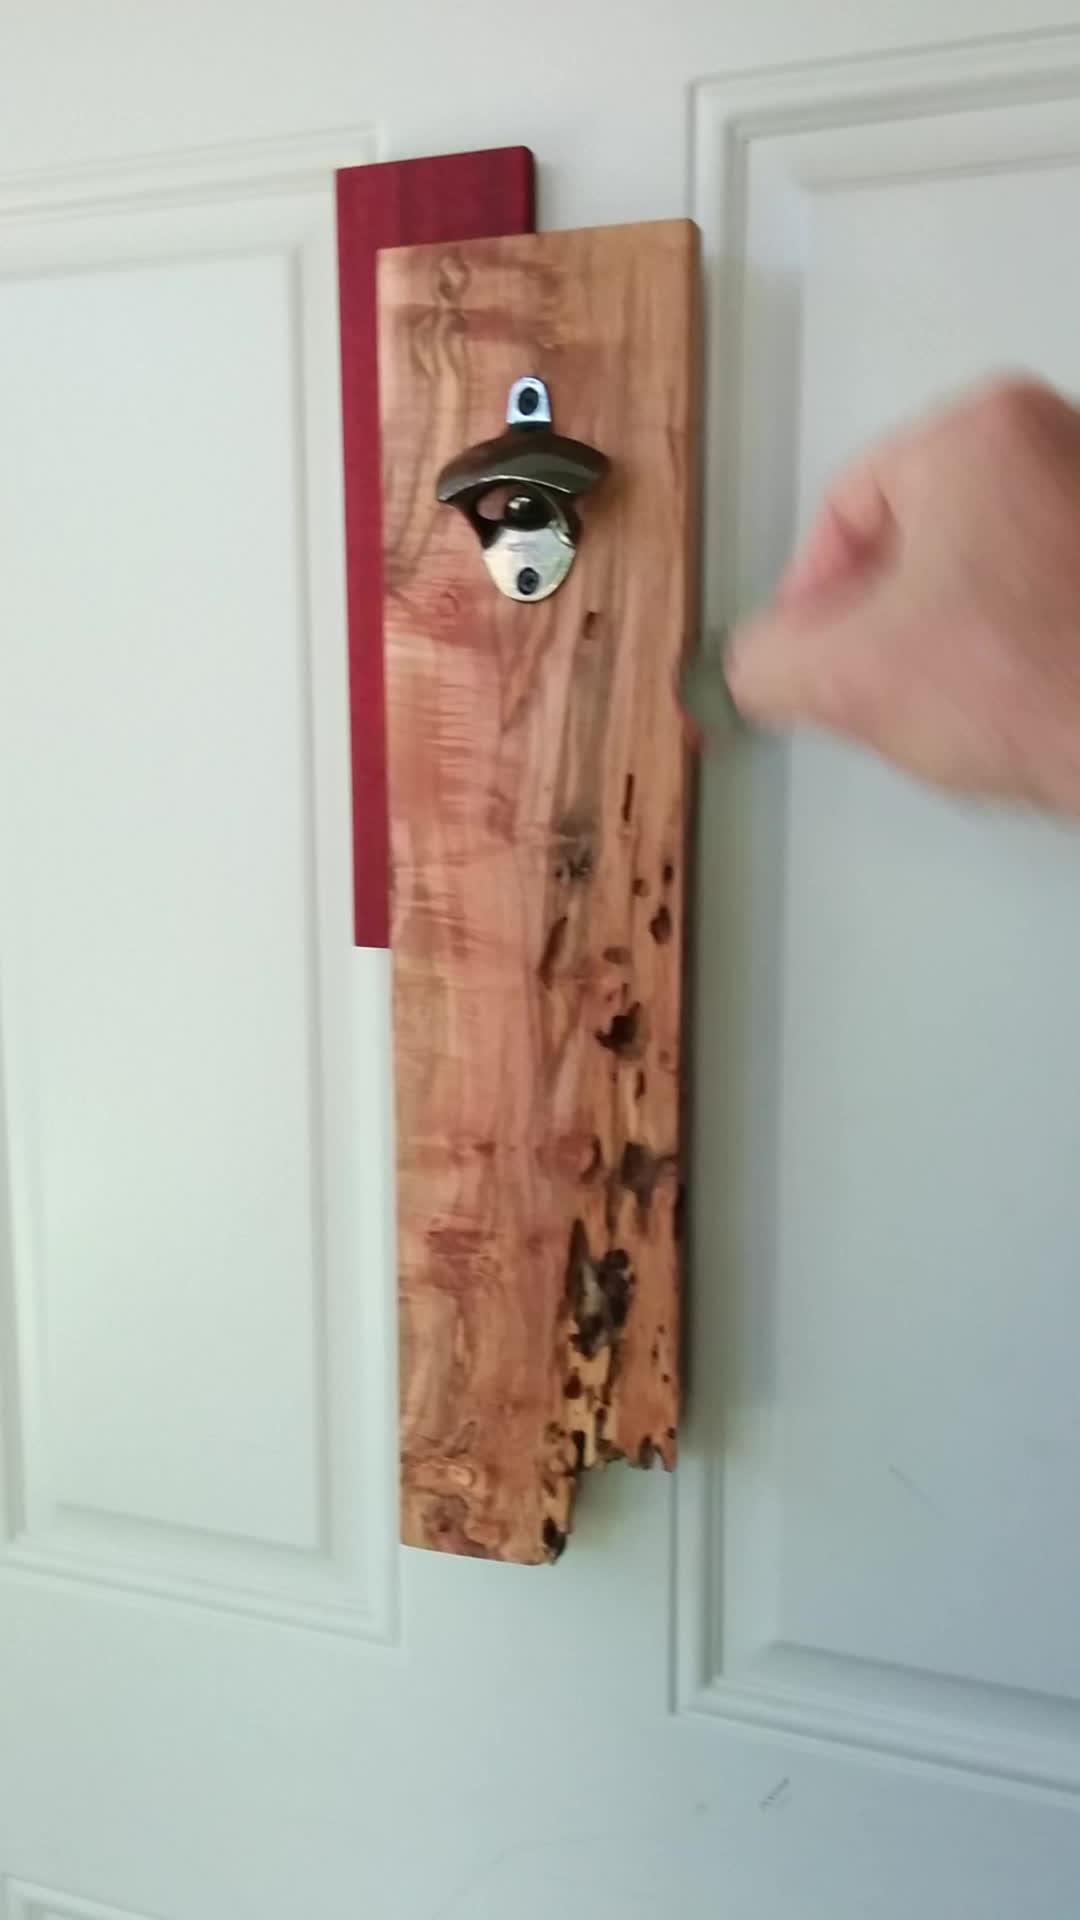 woodworking, Bottle opener with hidden magnet cap catch GIFs